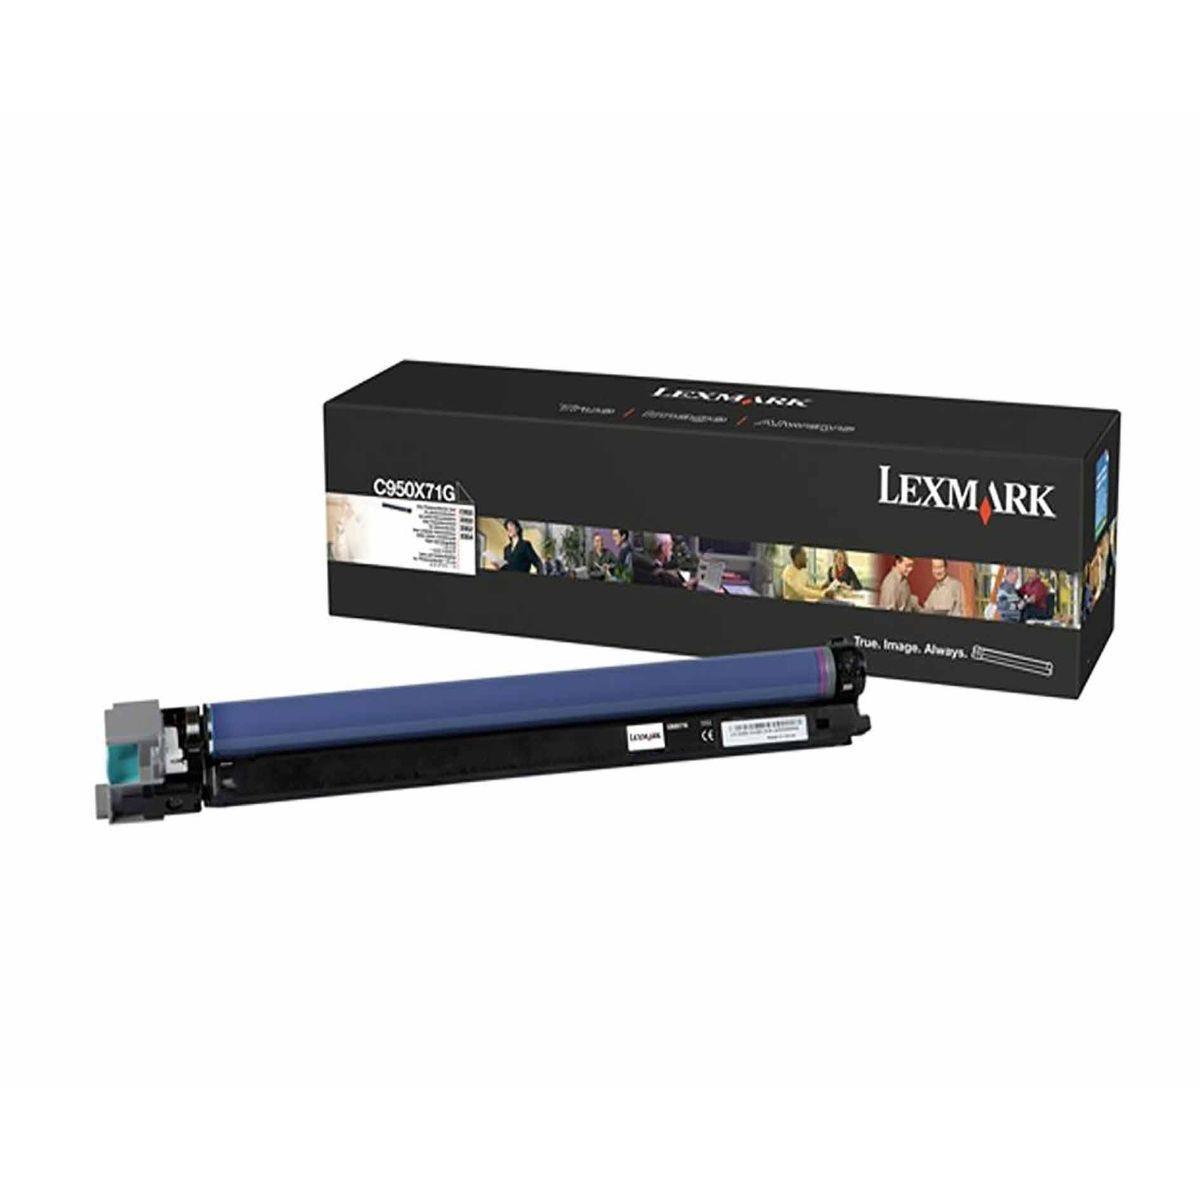 Lexmark C950X71G Photoconductor